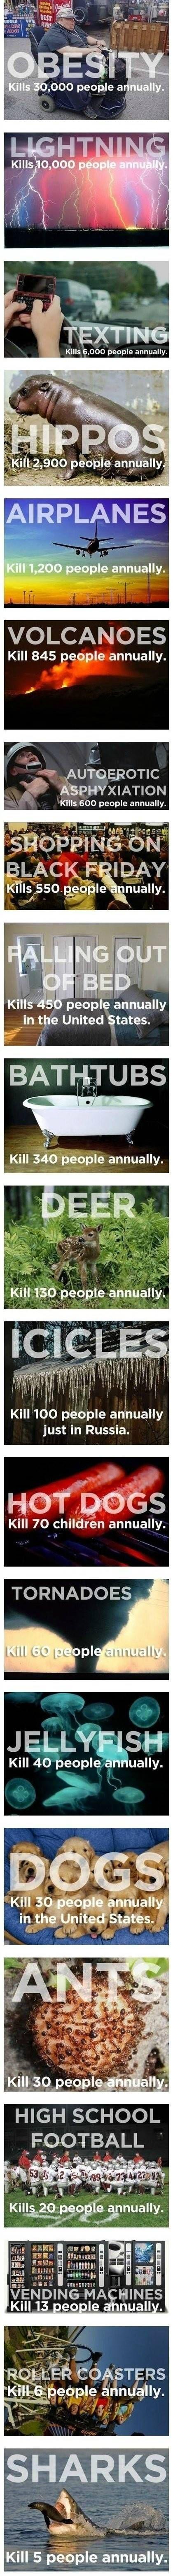 interesting statistics on death.